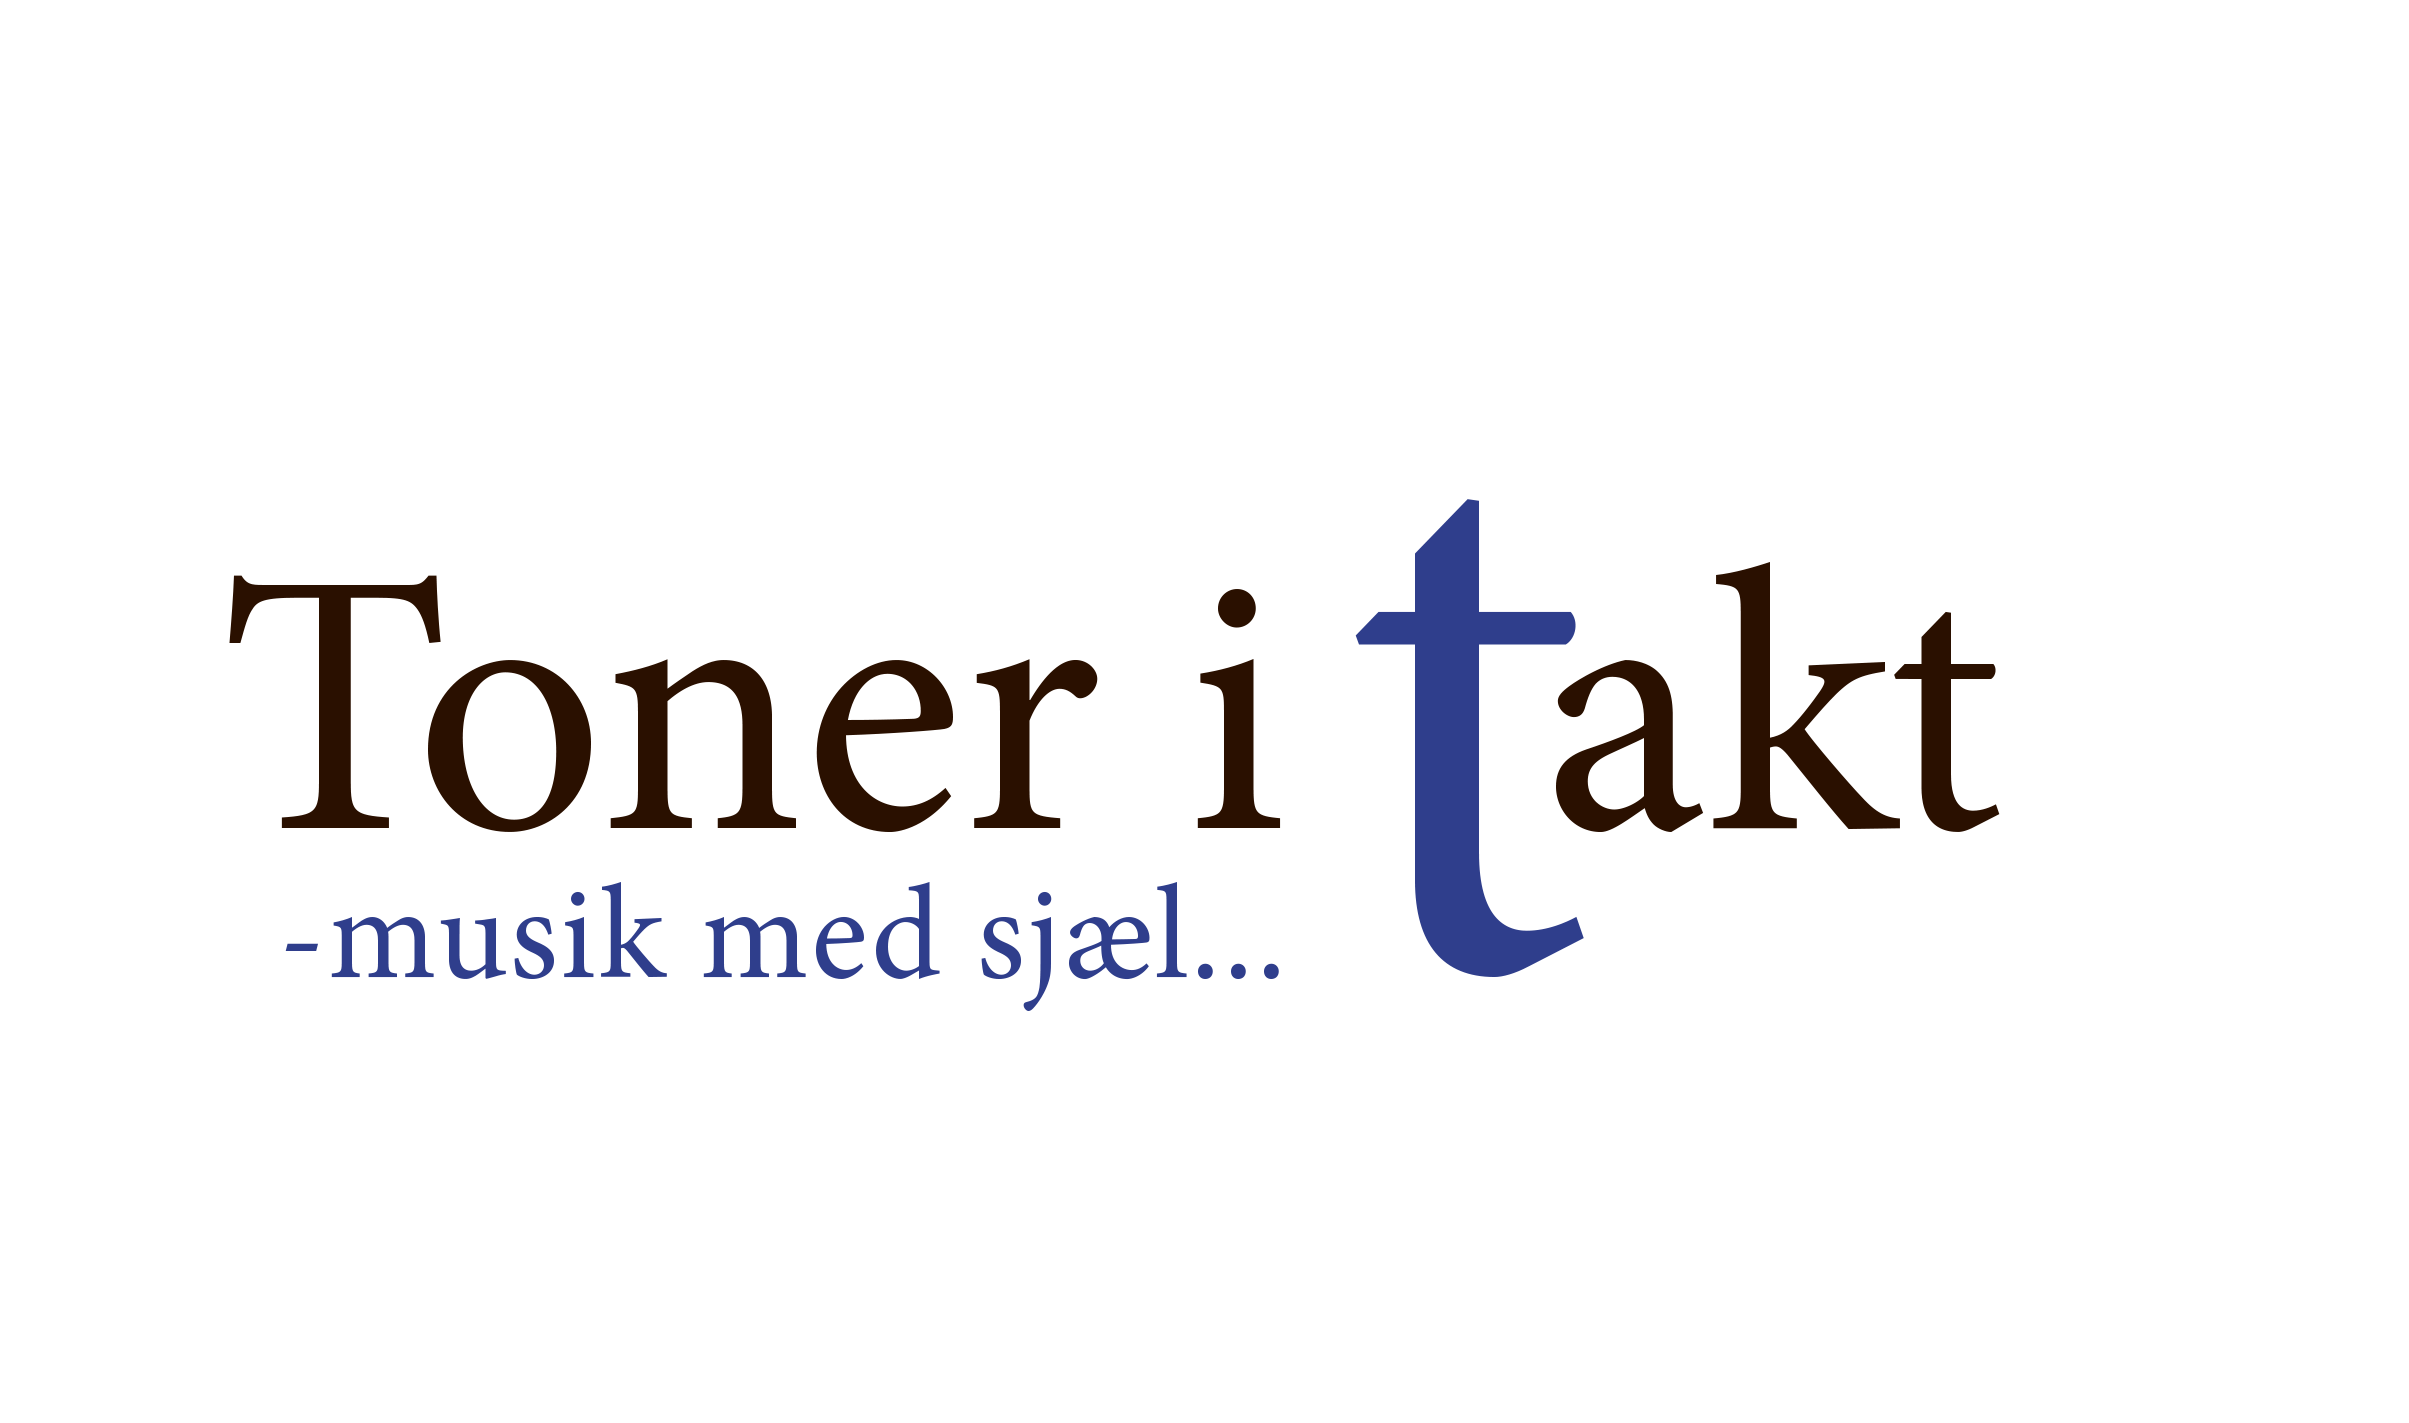 logo toner i takt 2017